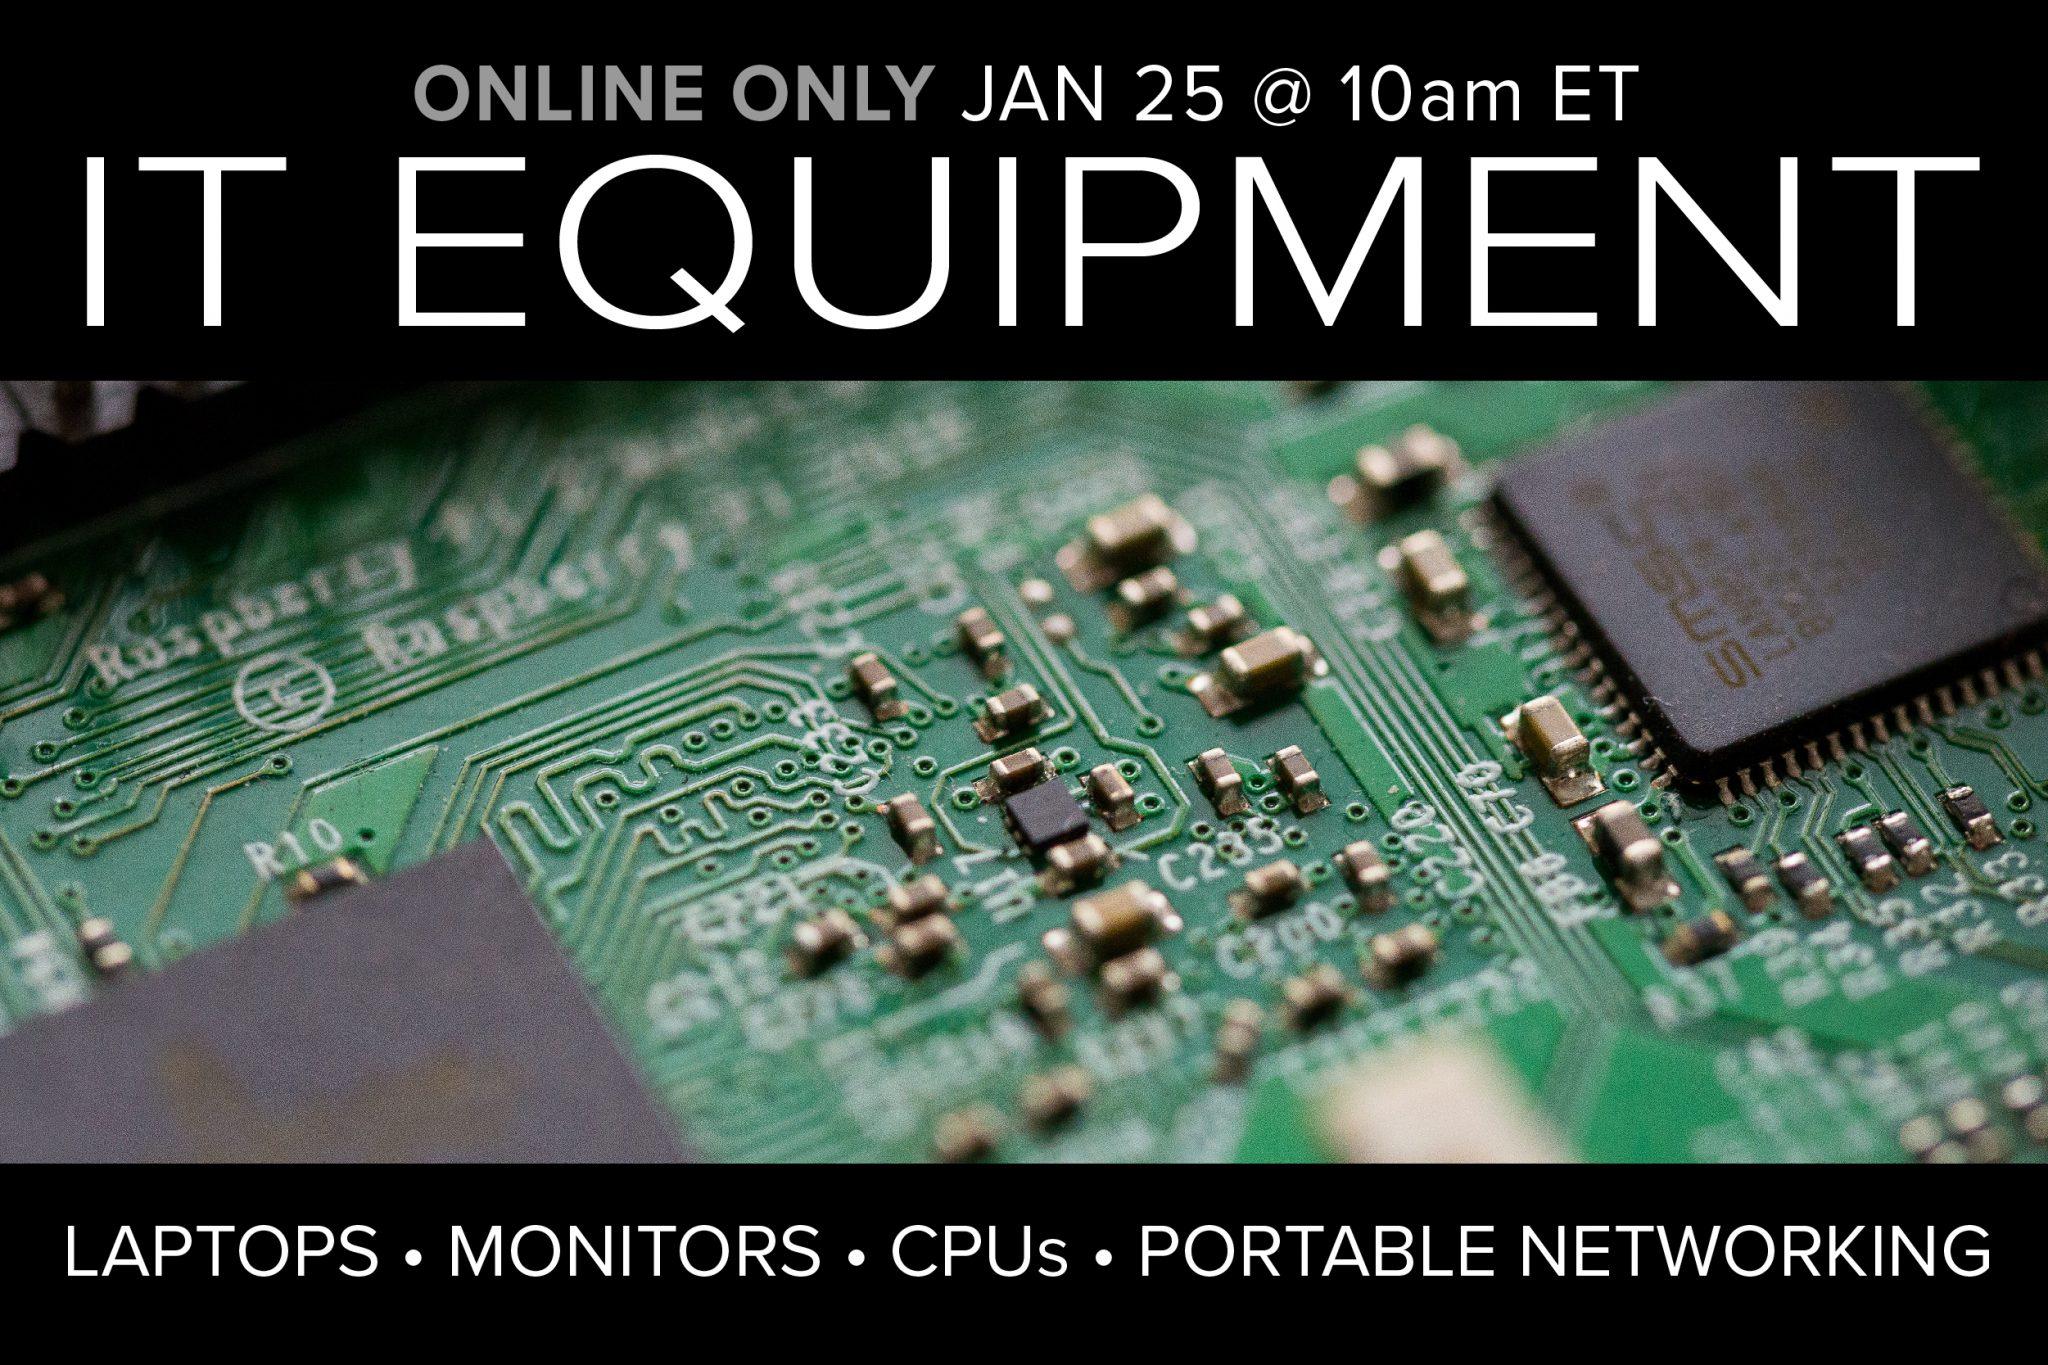 IT Equipment jan 25